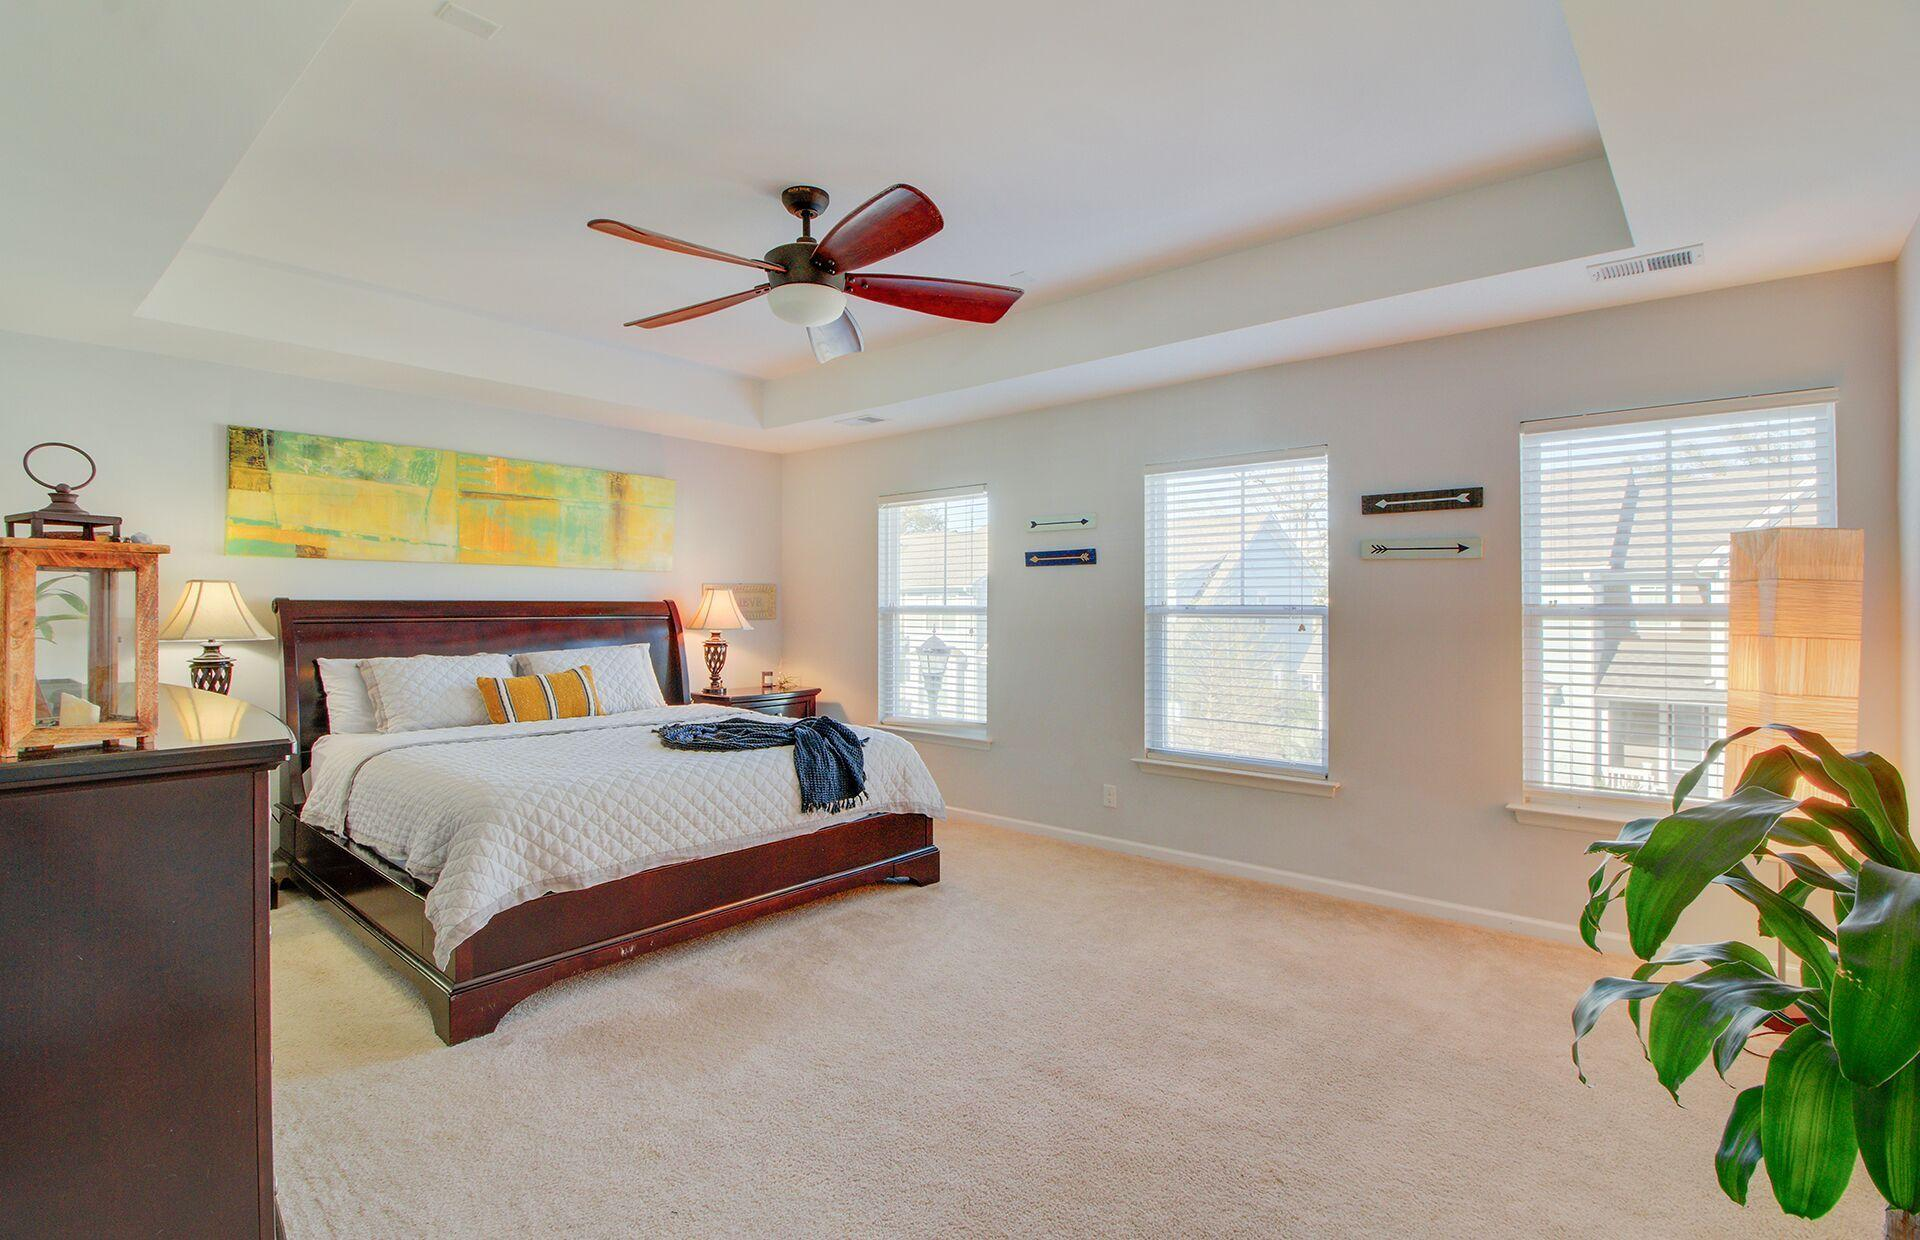 Oak Terrace Preserve Homes For Sale - 4967 Liberty Park, North Charleston, SC - 18